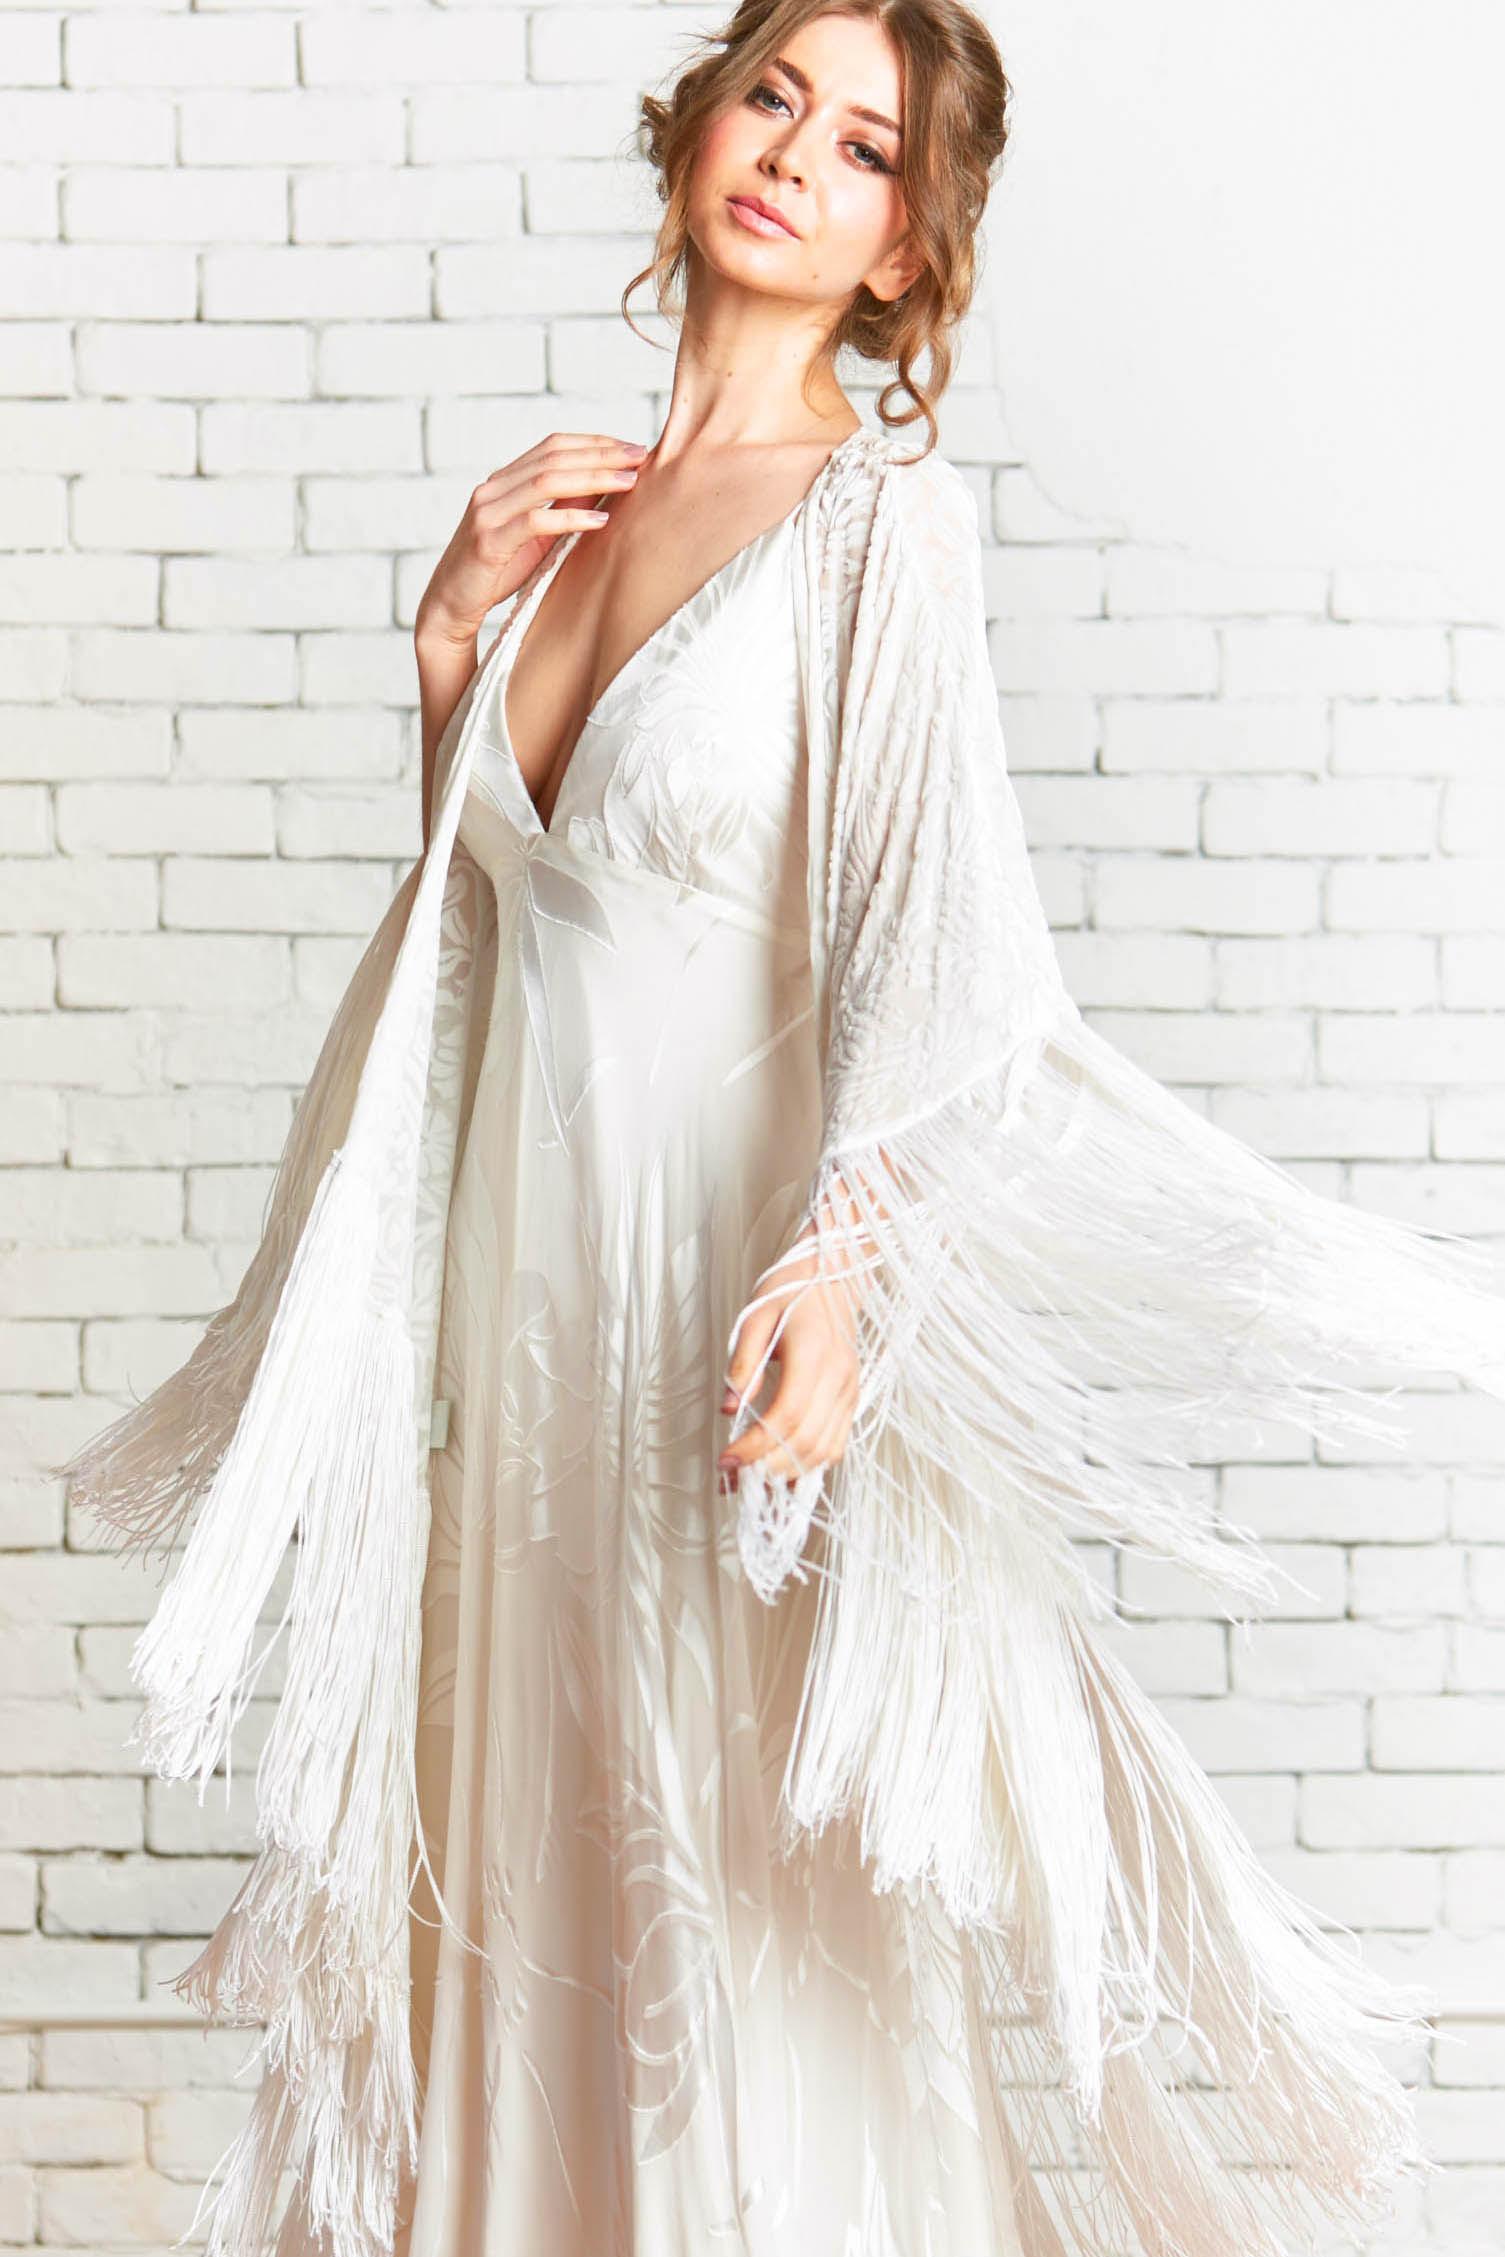 SiennaKimono_1front_Velvet_Burnout_Fringe_Boho_Kimono_Wedding_Coverup.jpg